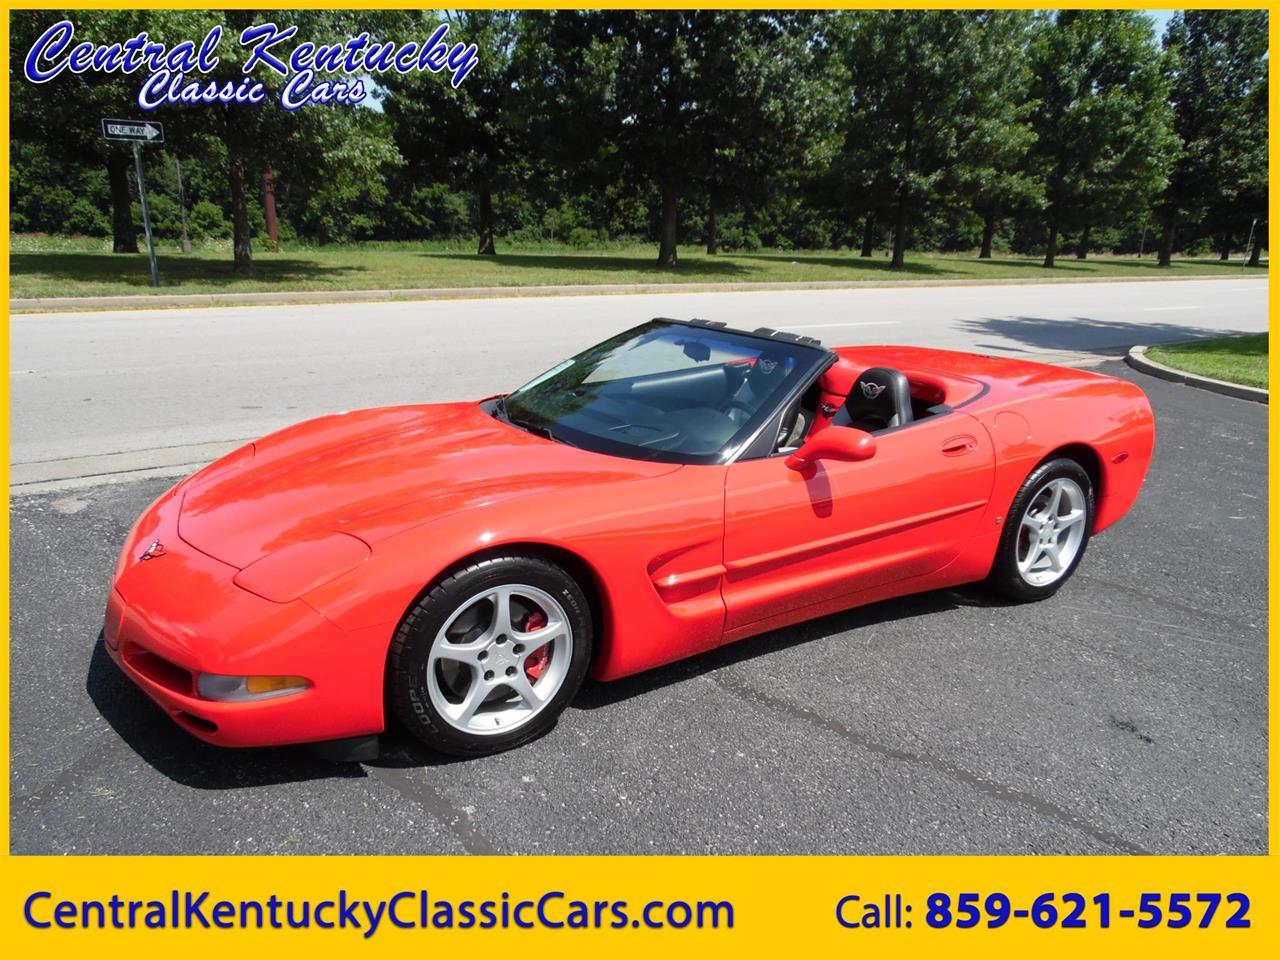 1999 Corvette For Sale >> For Sale 1999 Chevrolet Corvette In Paris Kentucky